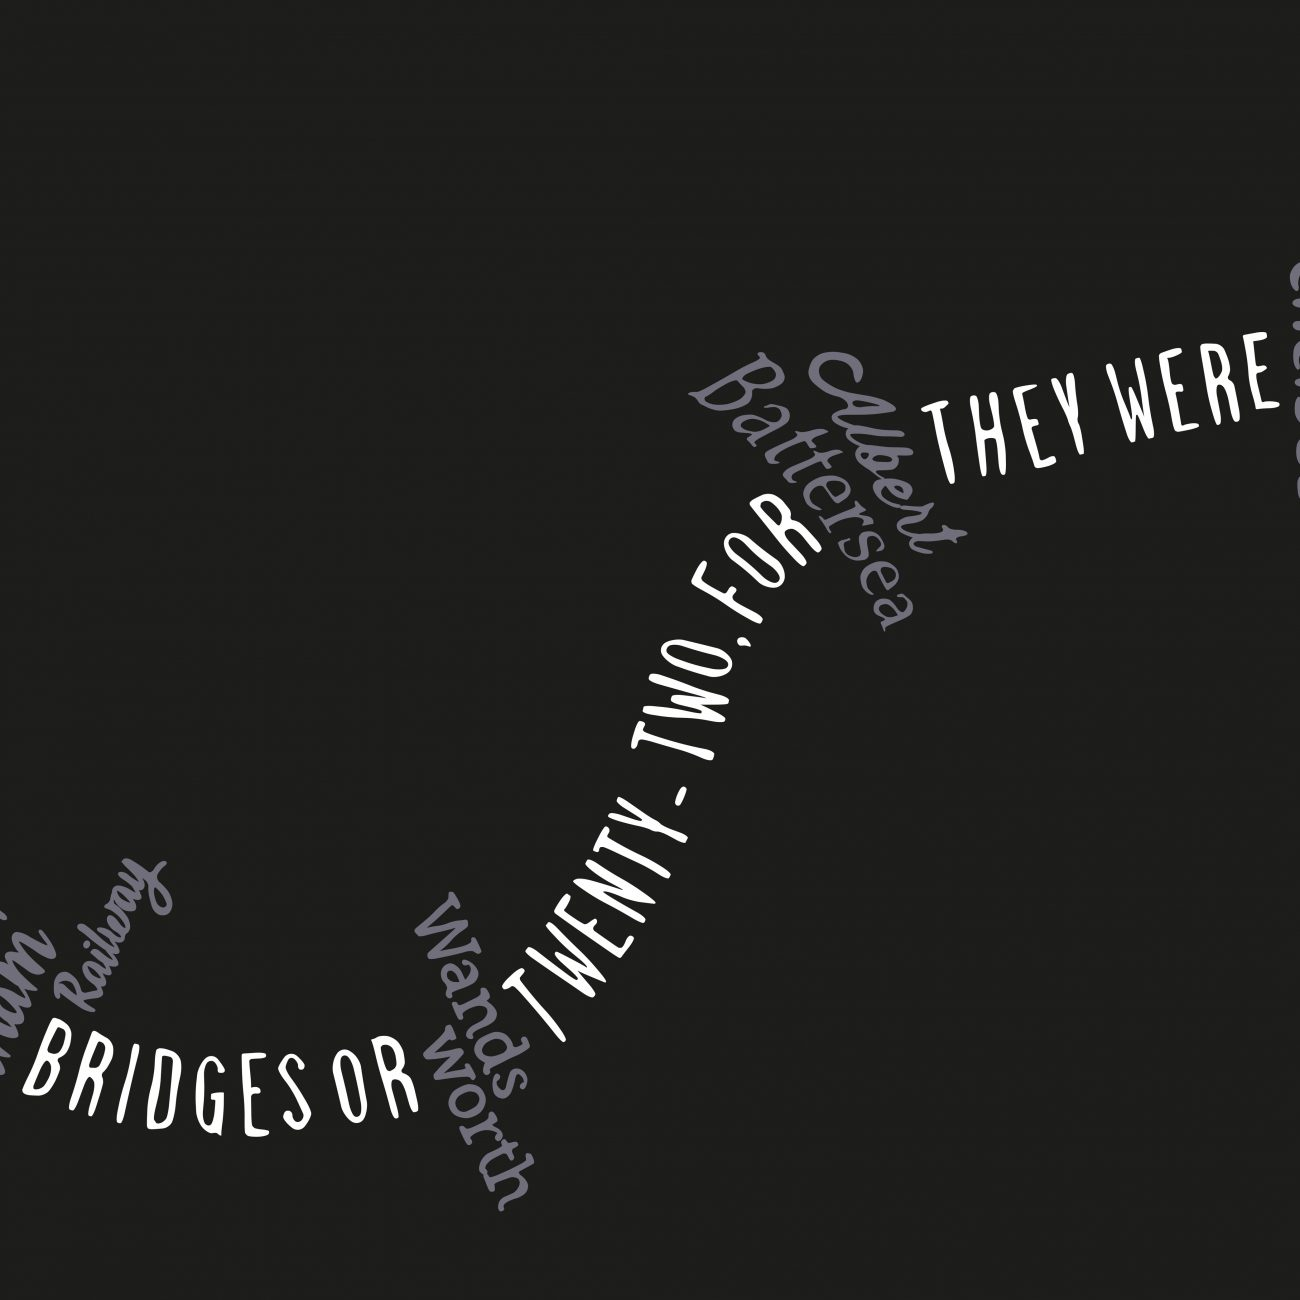 typographic art river thames